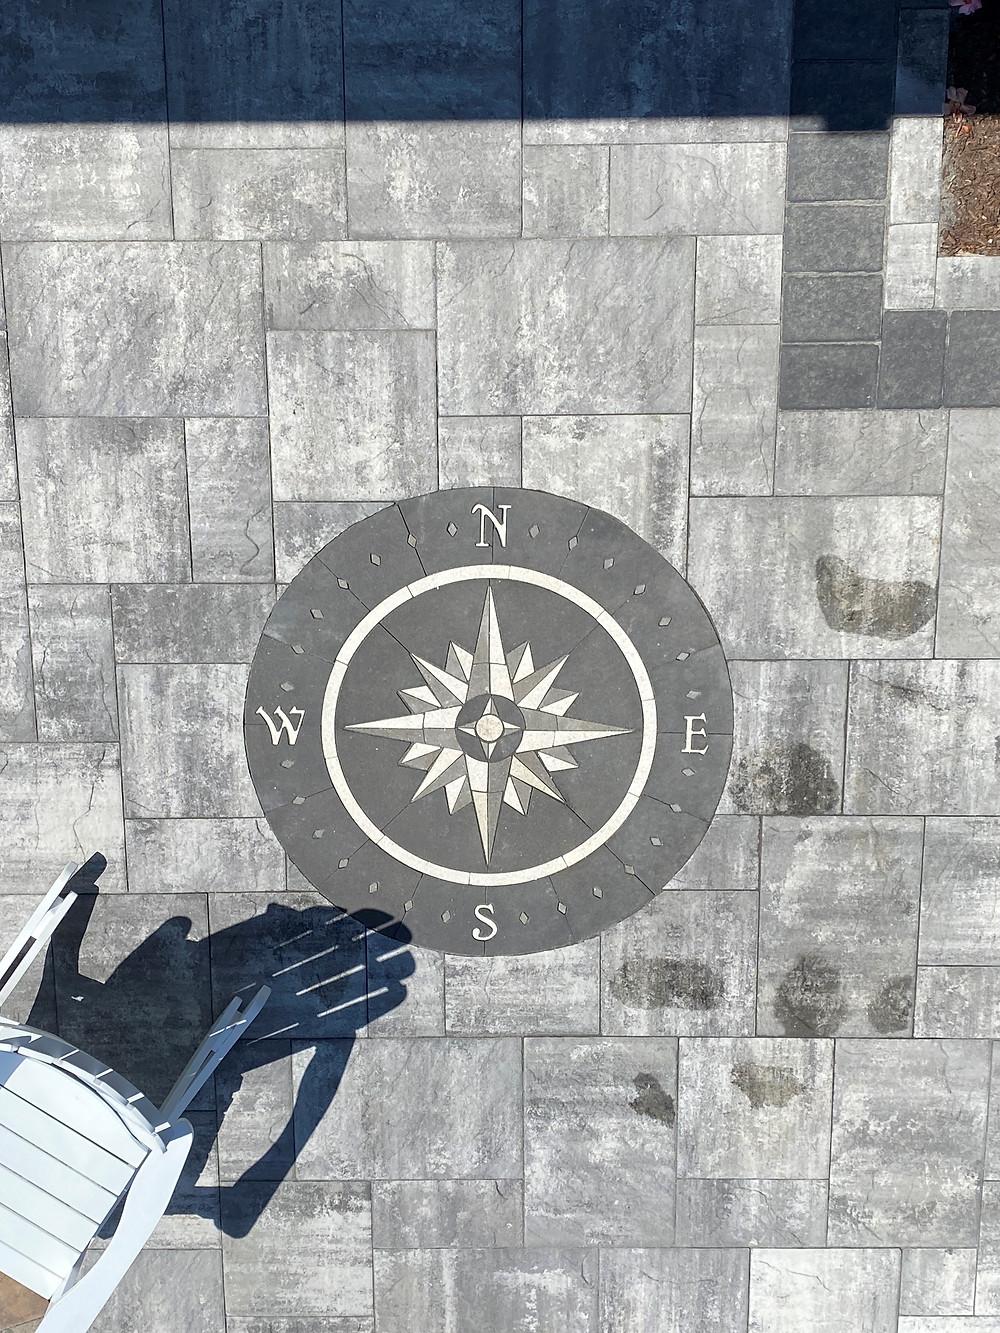 compass rose paver kit, patio compass, patio ideas, patio design kits, outdoor living